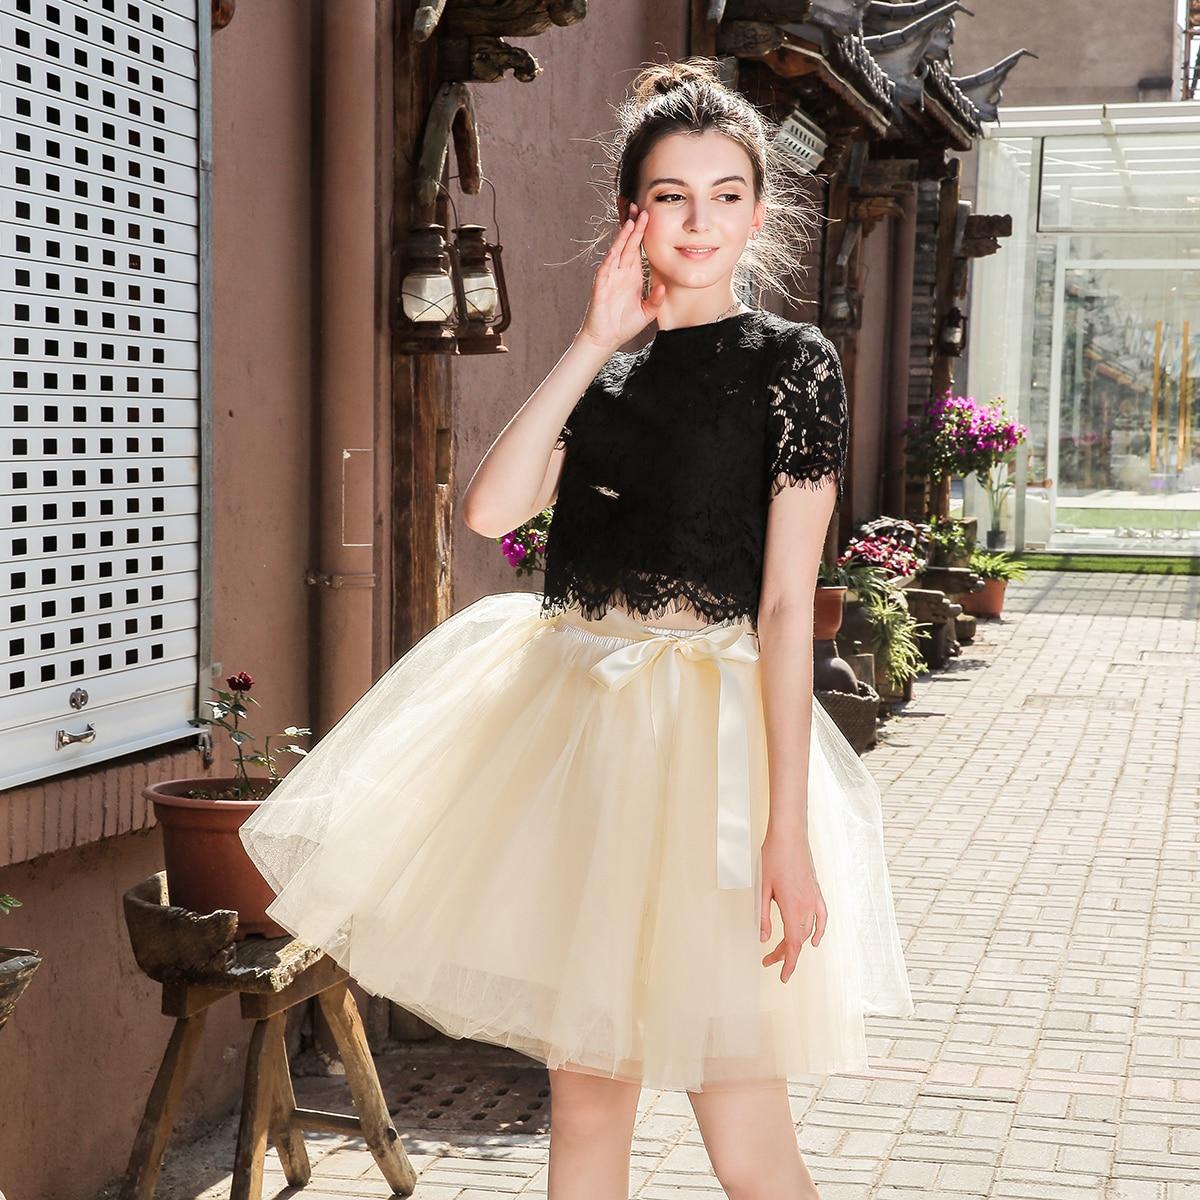 Skirts Womens 7 Layers Midi Tulle Skirt Fashion Tutu Skirts Women Ball Gown Party Petticoat 2020 Lolita Faldas Saia